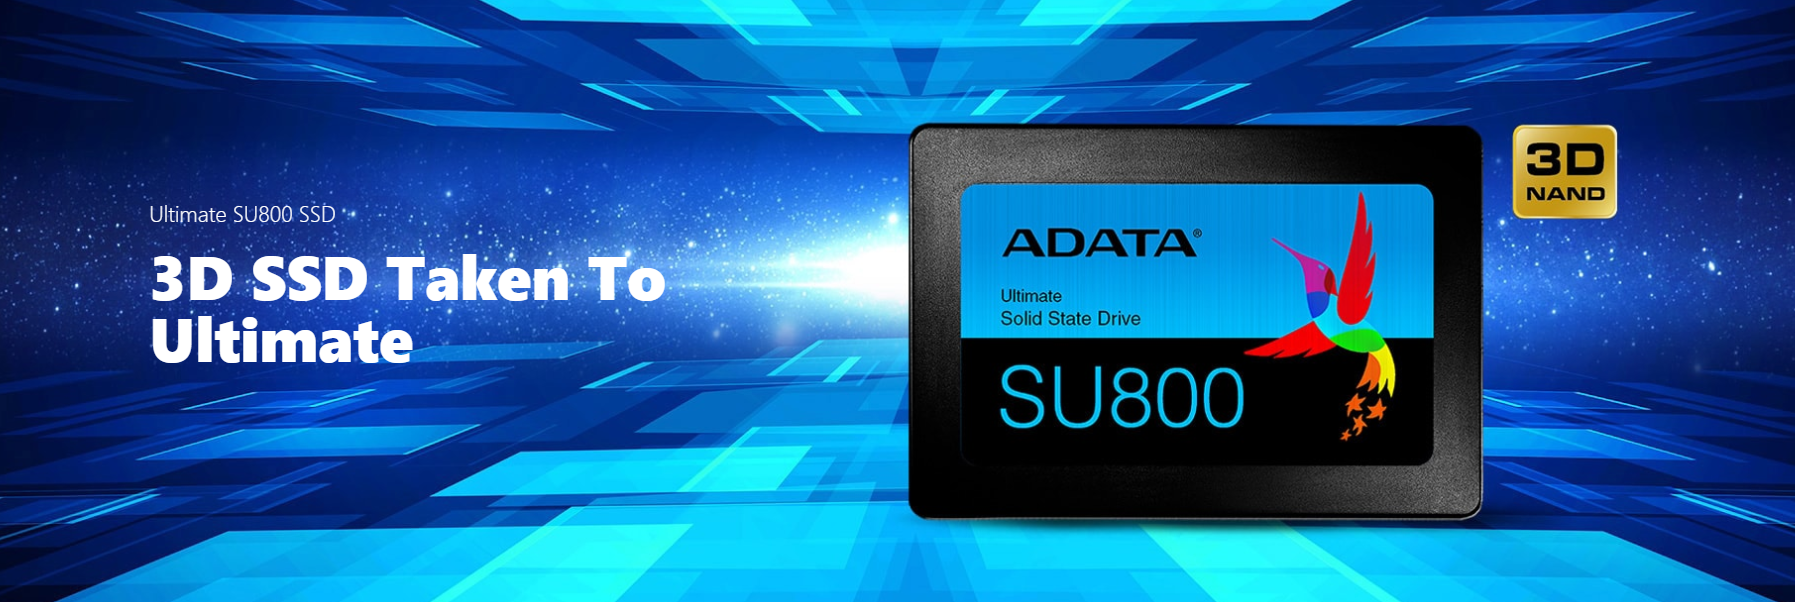 Adata Ultimate Su800 256gb 3d Nand 25 Inch Sata Iii Internal Solid Ssd Samsung 850 Evo 250 Gb 30 V Technology State Drive